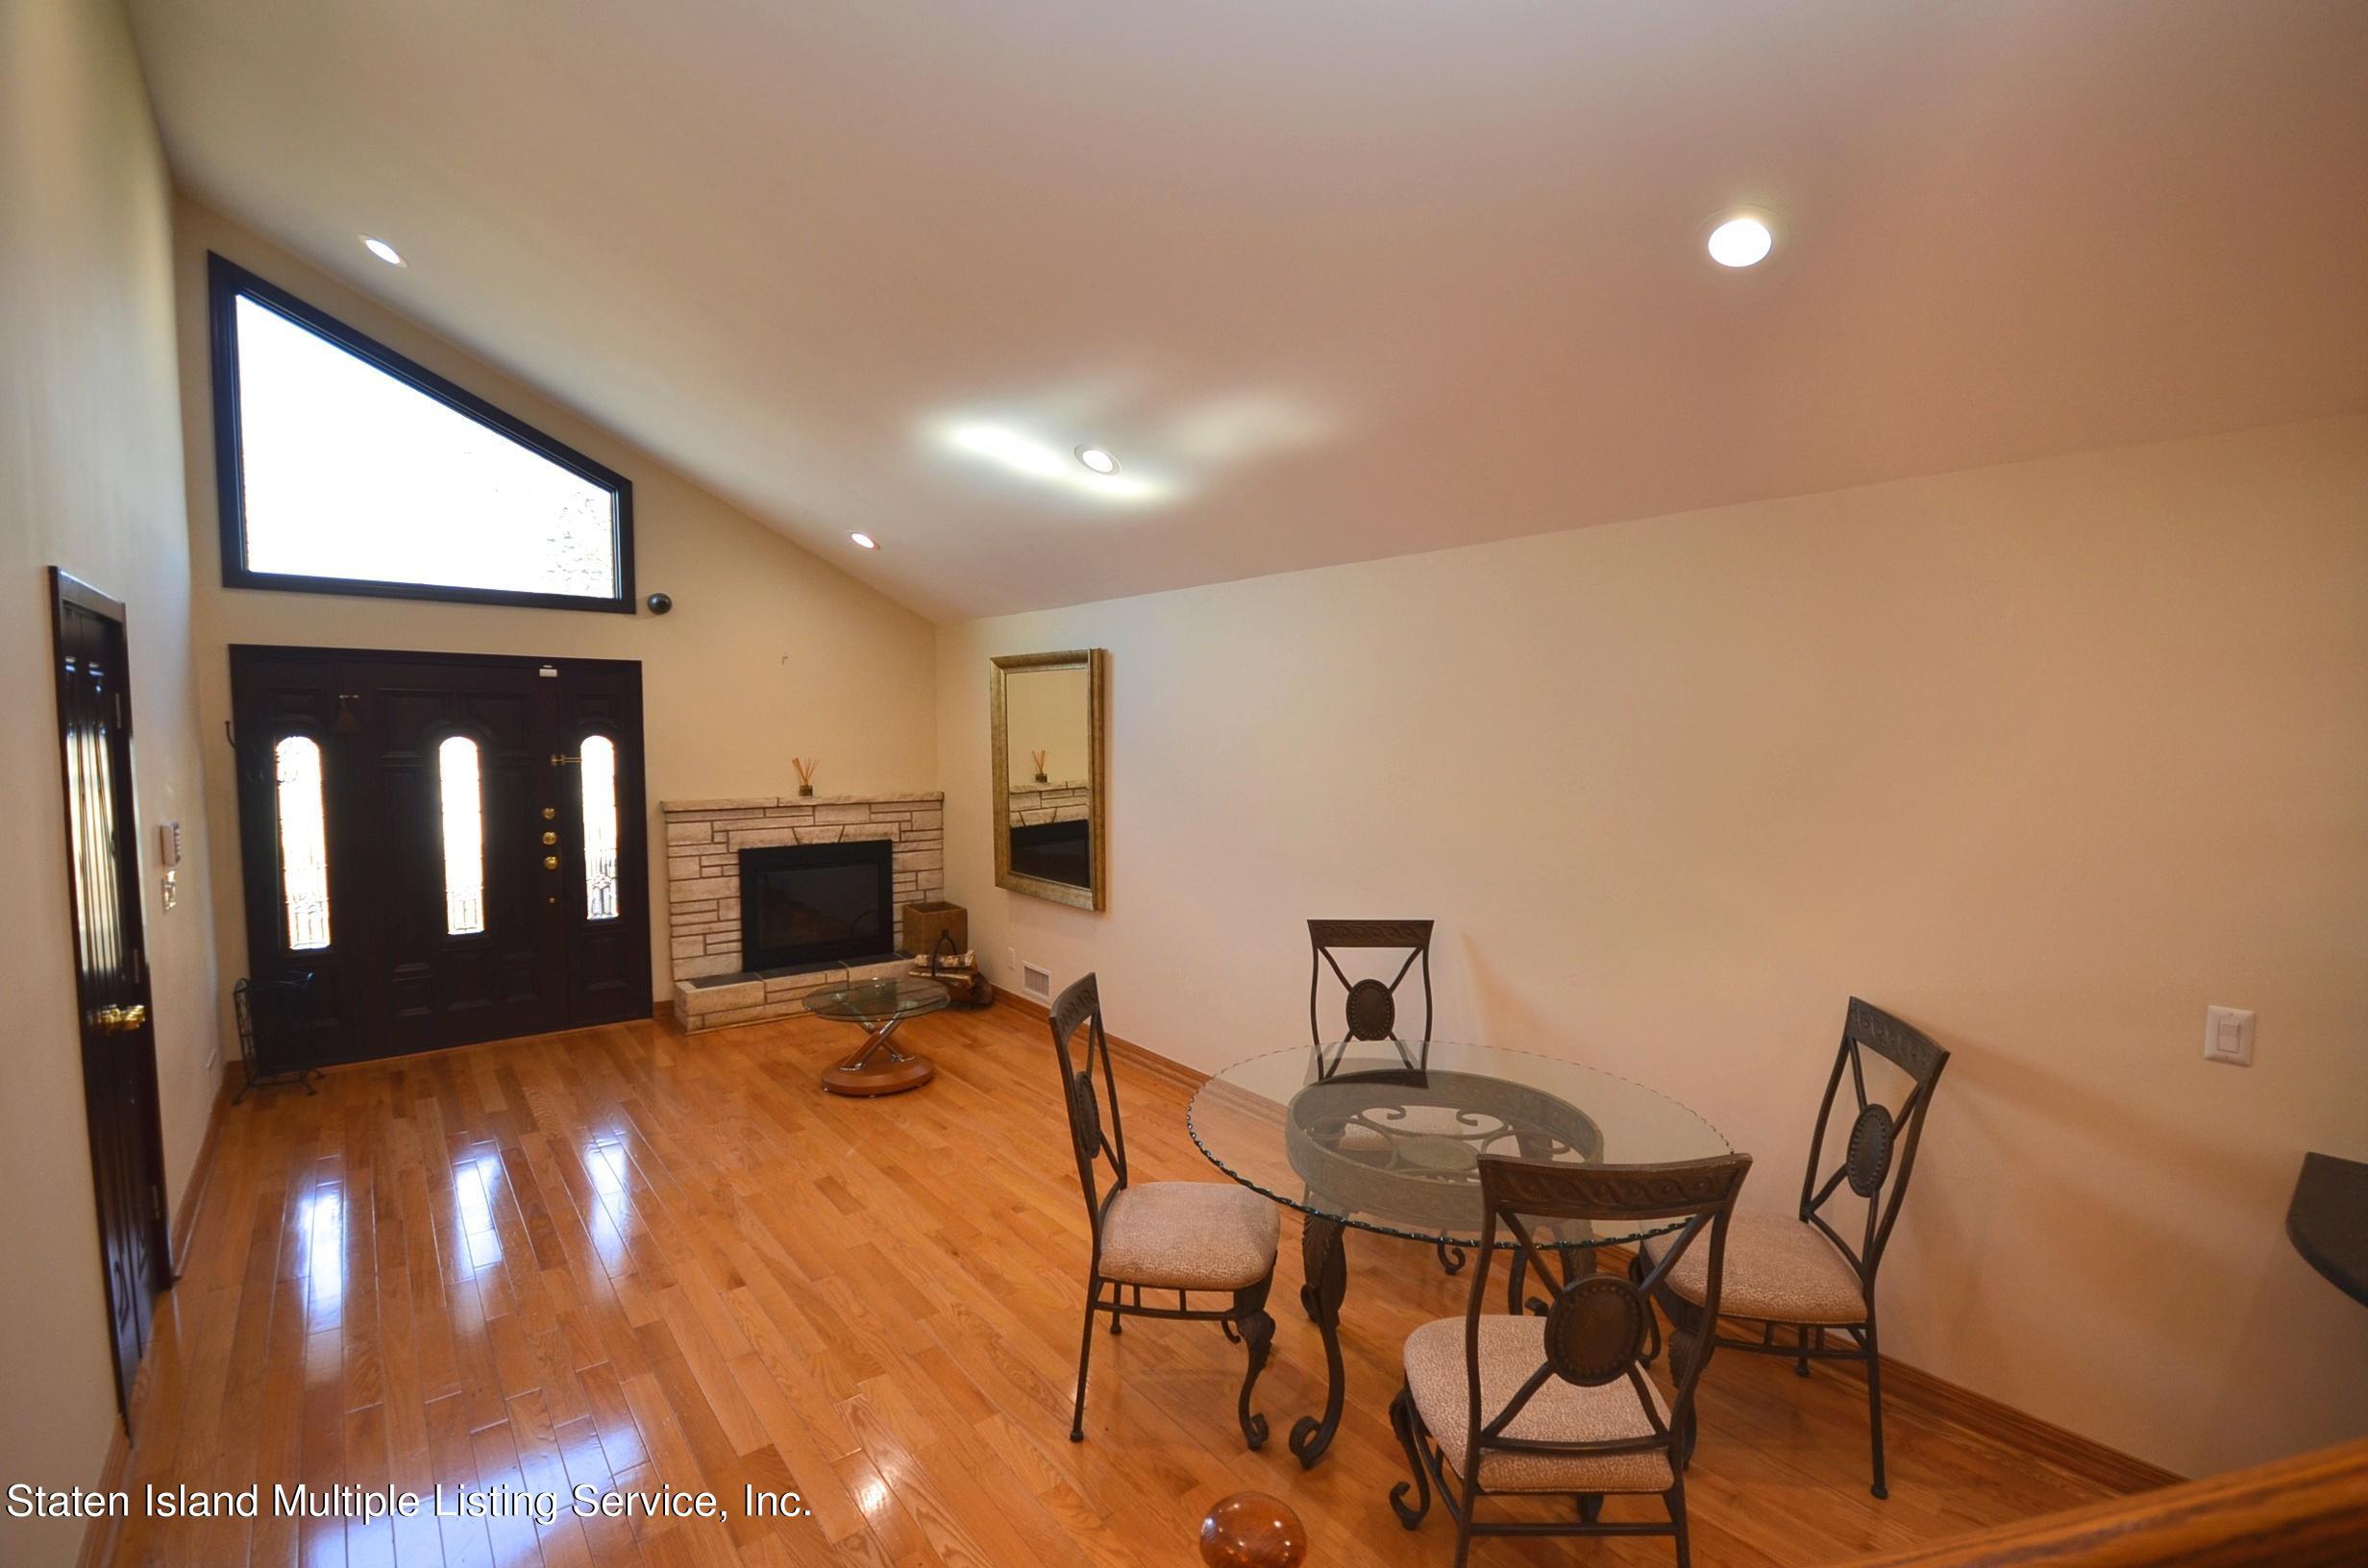 Single Family - Detached 48 Ocean Terrace  Staten Island, NY 10314, MLS-1142240-11